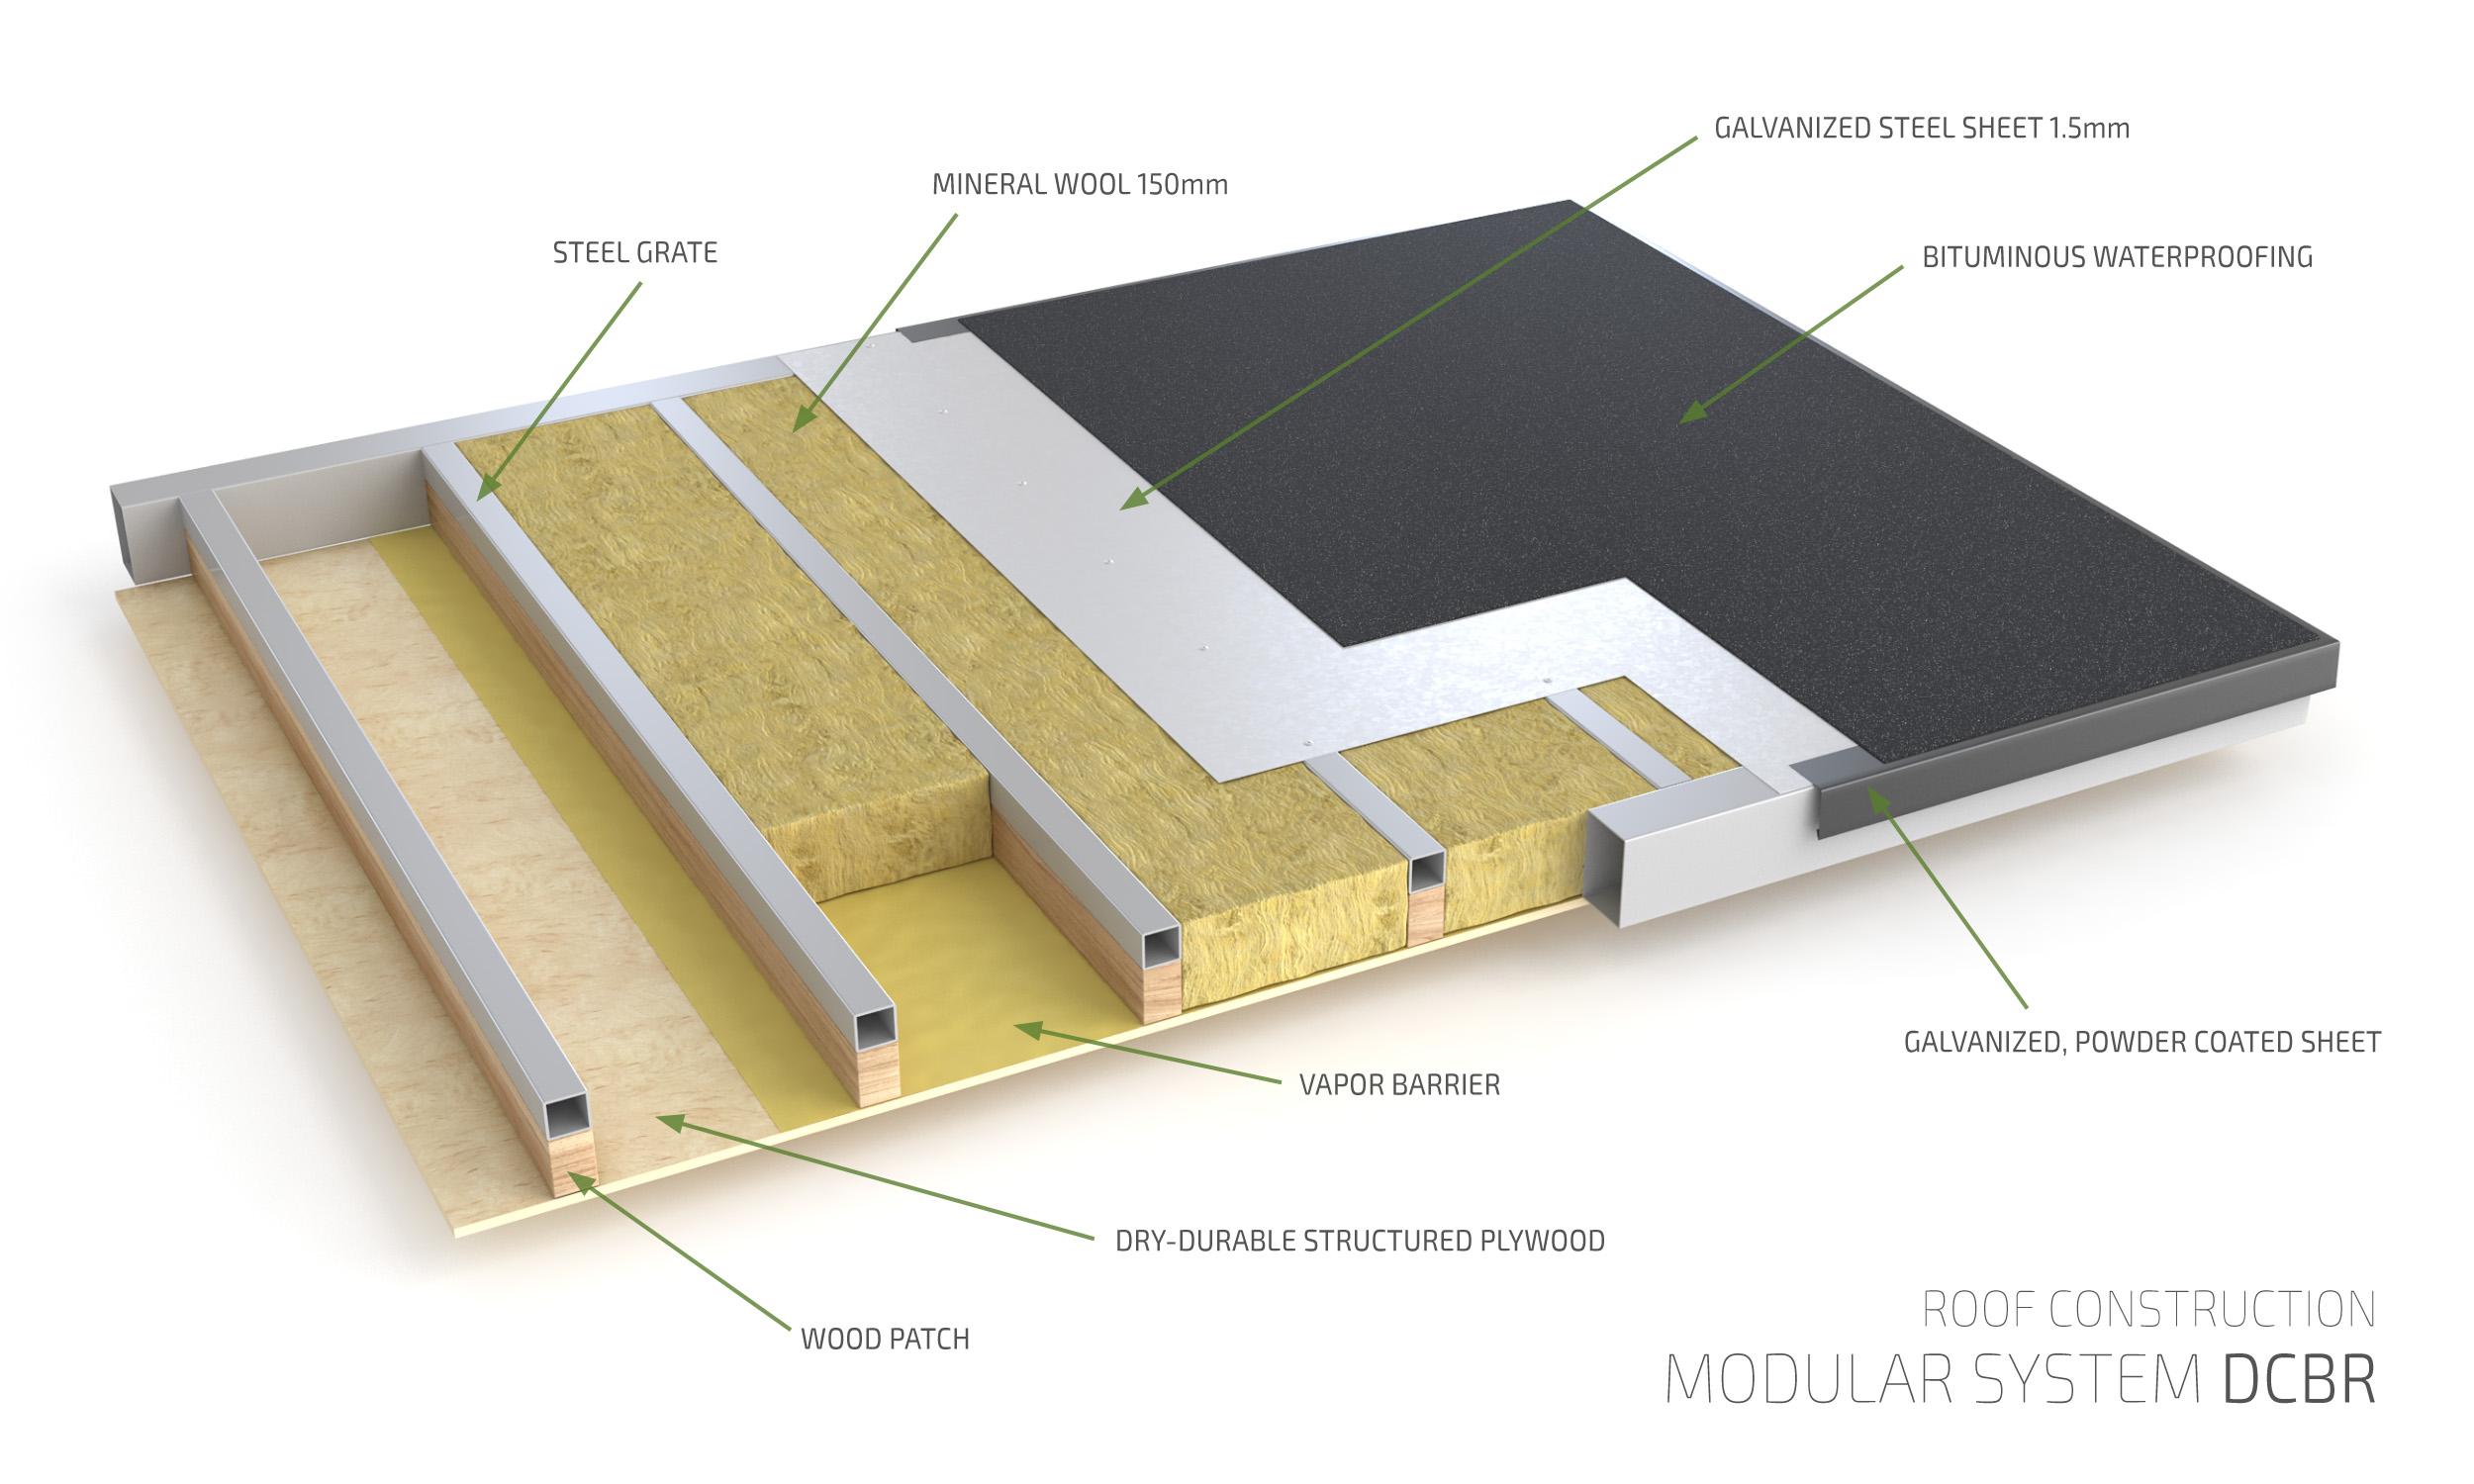 Roof Construction Modular System DCBR